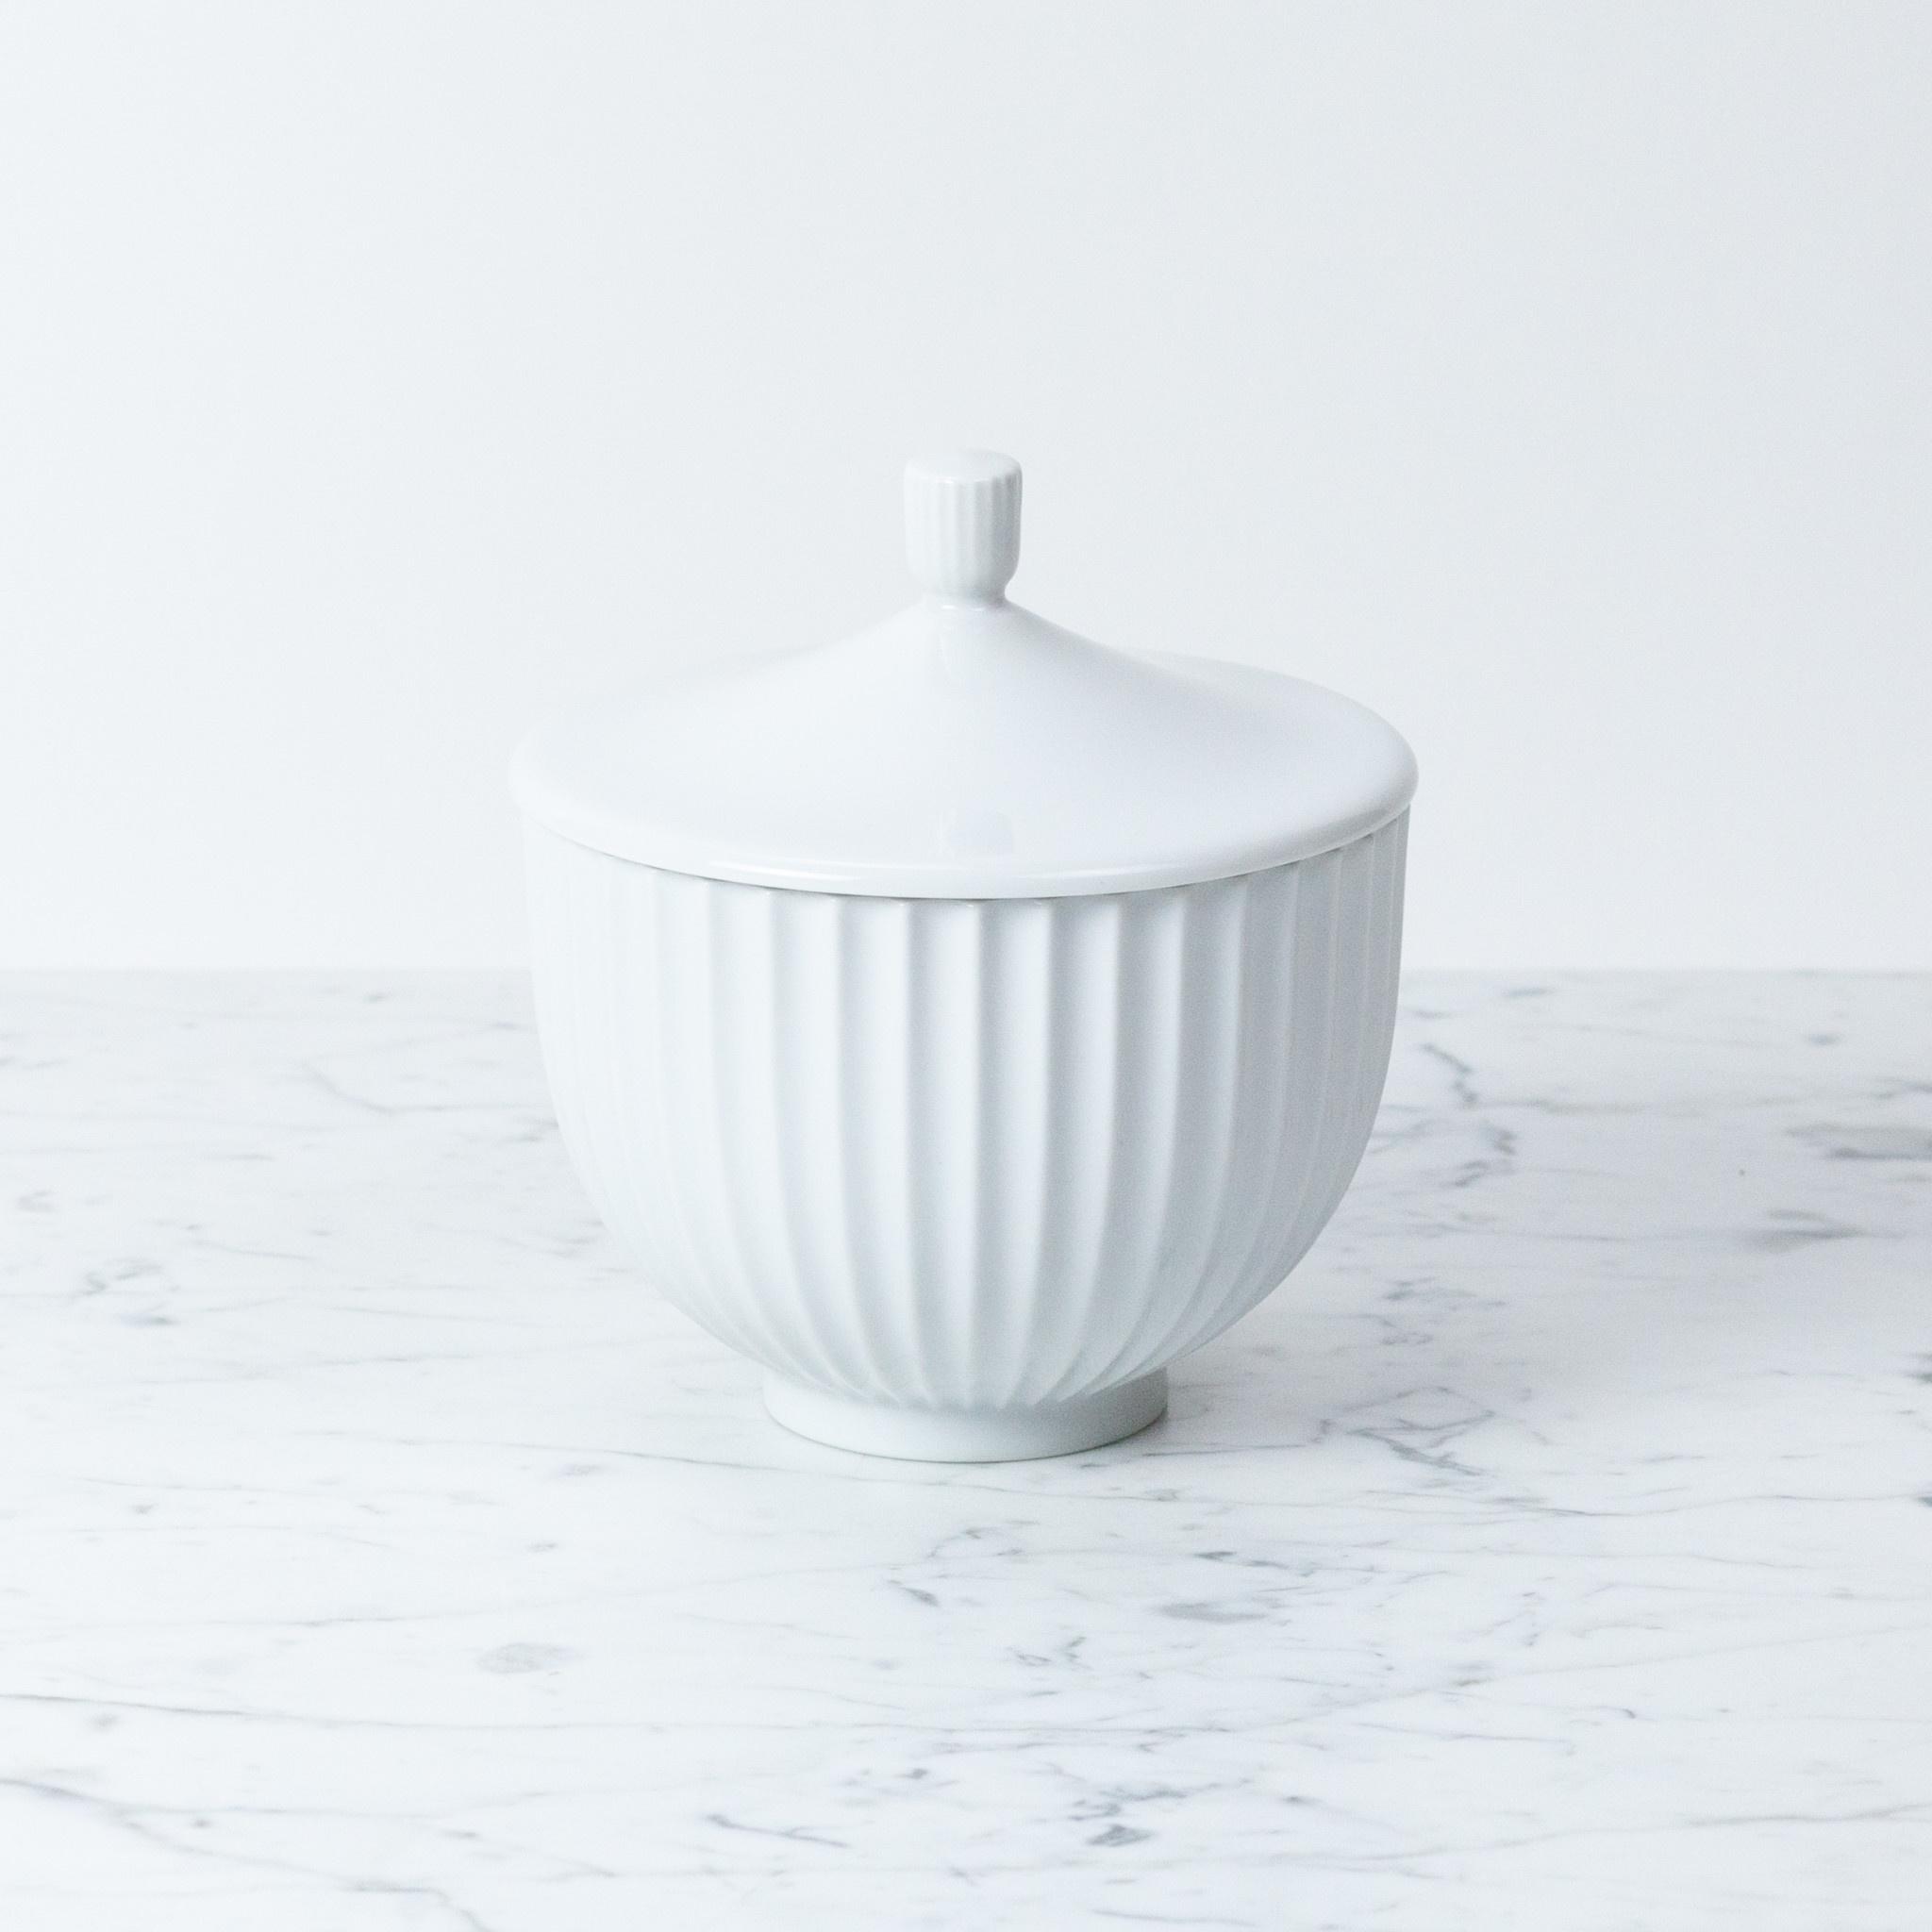 Lyngby Porcelain Lyngby Bonbonniere - 14 cm - White Porcelain